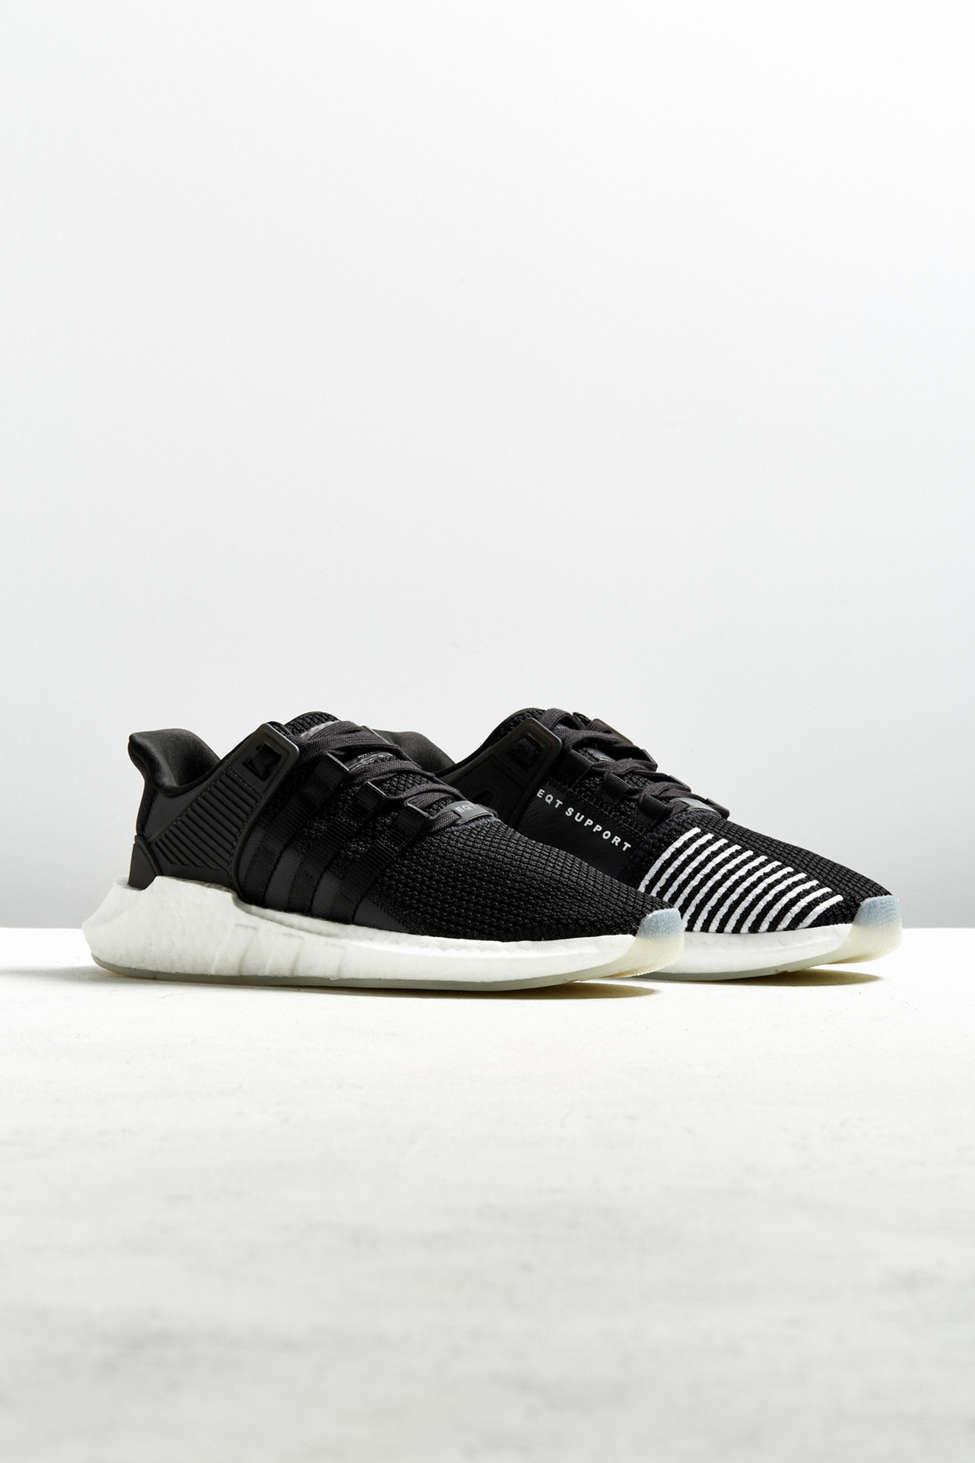 Adidas Eqt Sostegno 93 / 17 Nucleo Scarpe Urban Outfitters